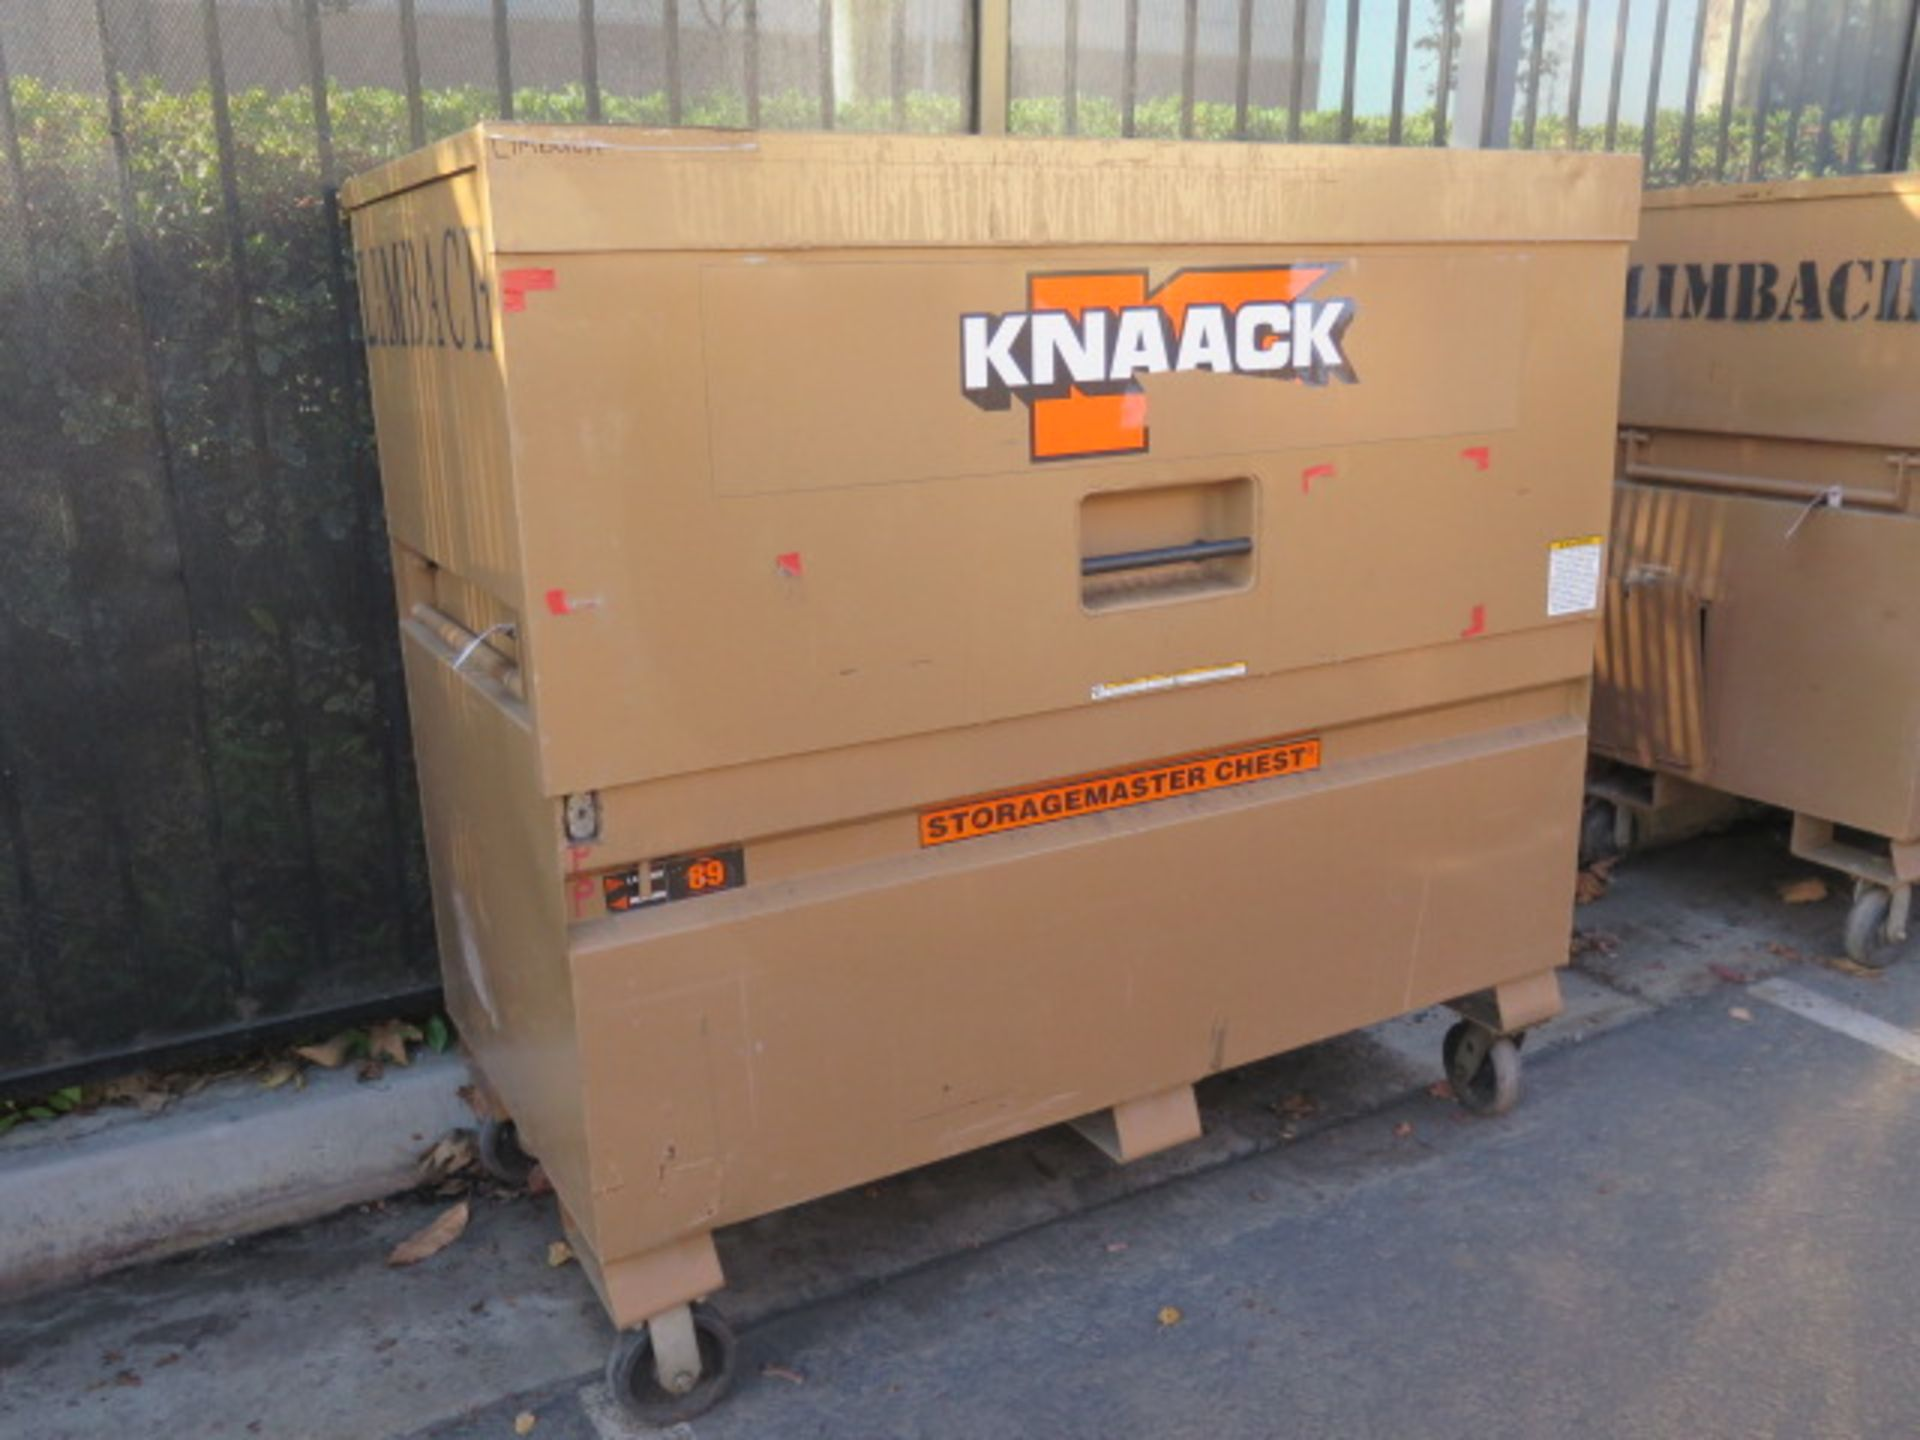 Knaack mdl. 89 Storagemaster Rolling Job Box w/ Ridgid Tri-Stands (SOLD AS-IS - NO WARRANTY)